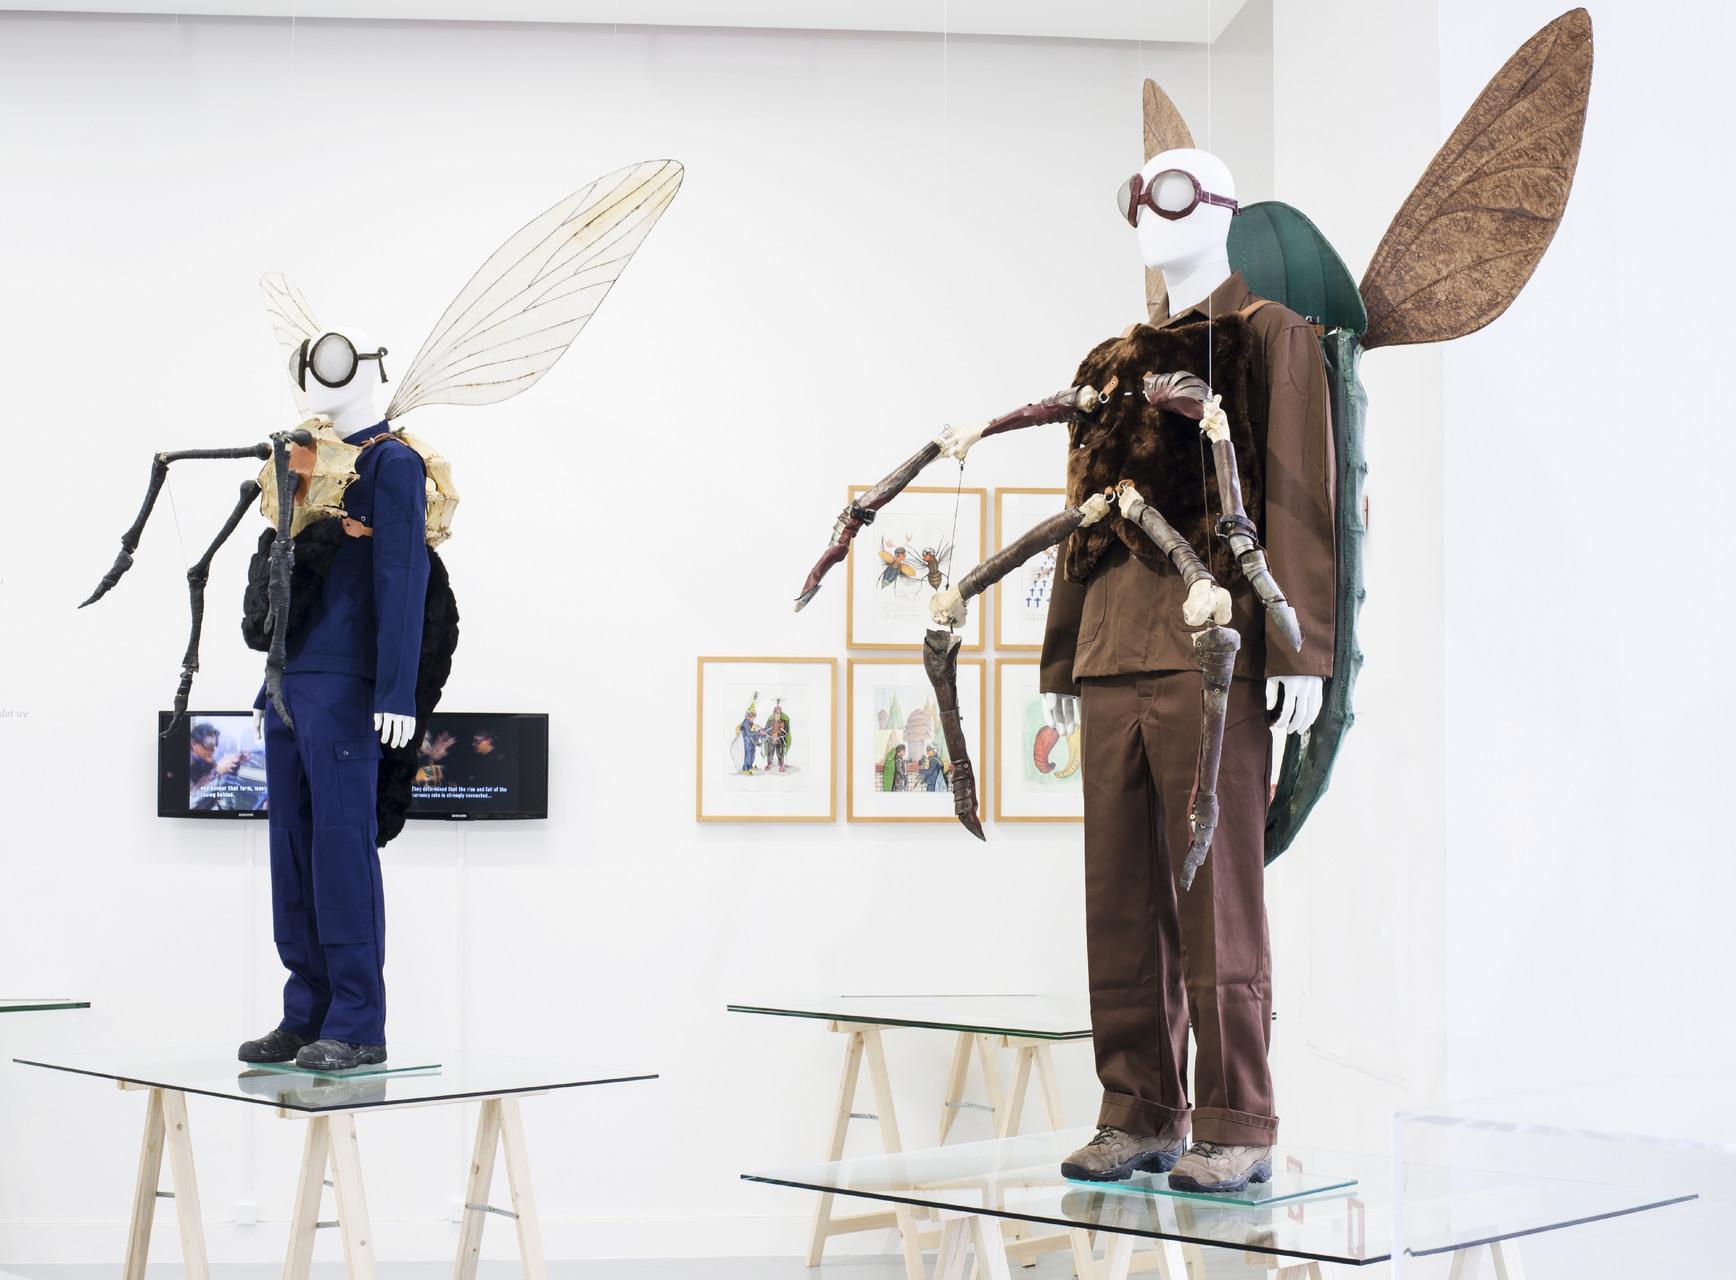 Jan_Fabre,_exhibition_view_M_HKA_2015_photo_M_HKAclinckx13